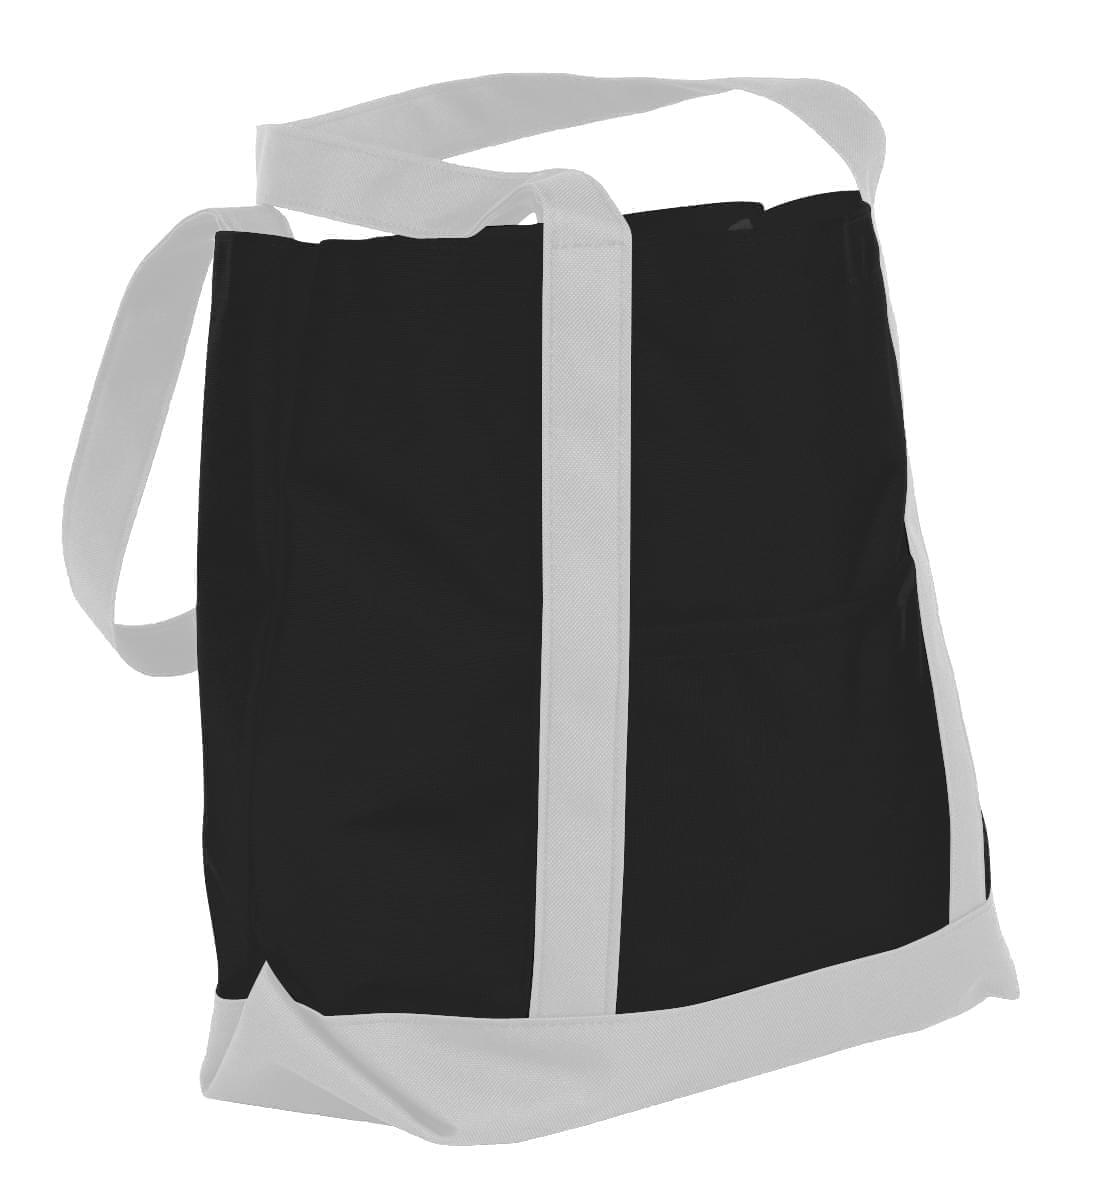 USA Made Canvas Fashion Tote Bags, Black-White, XAACL1UAHP